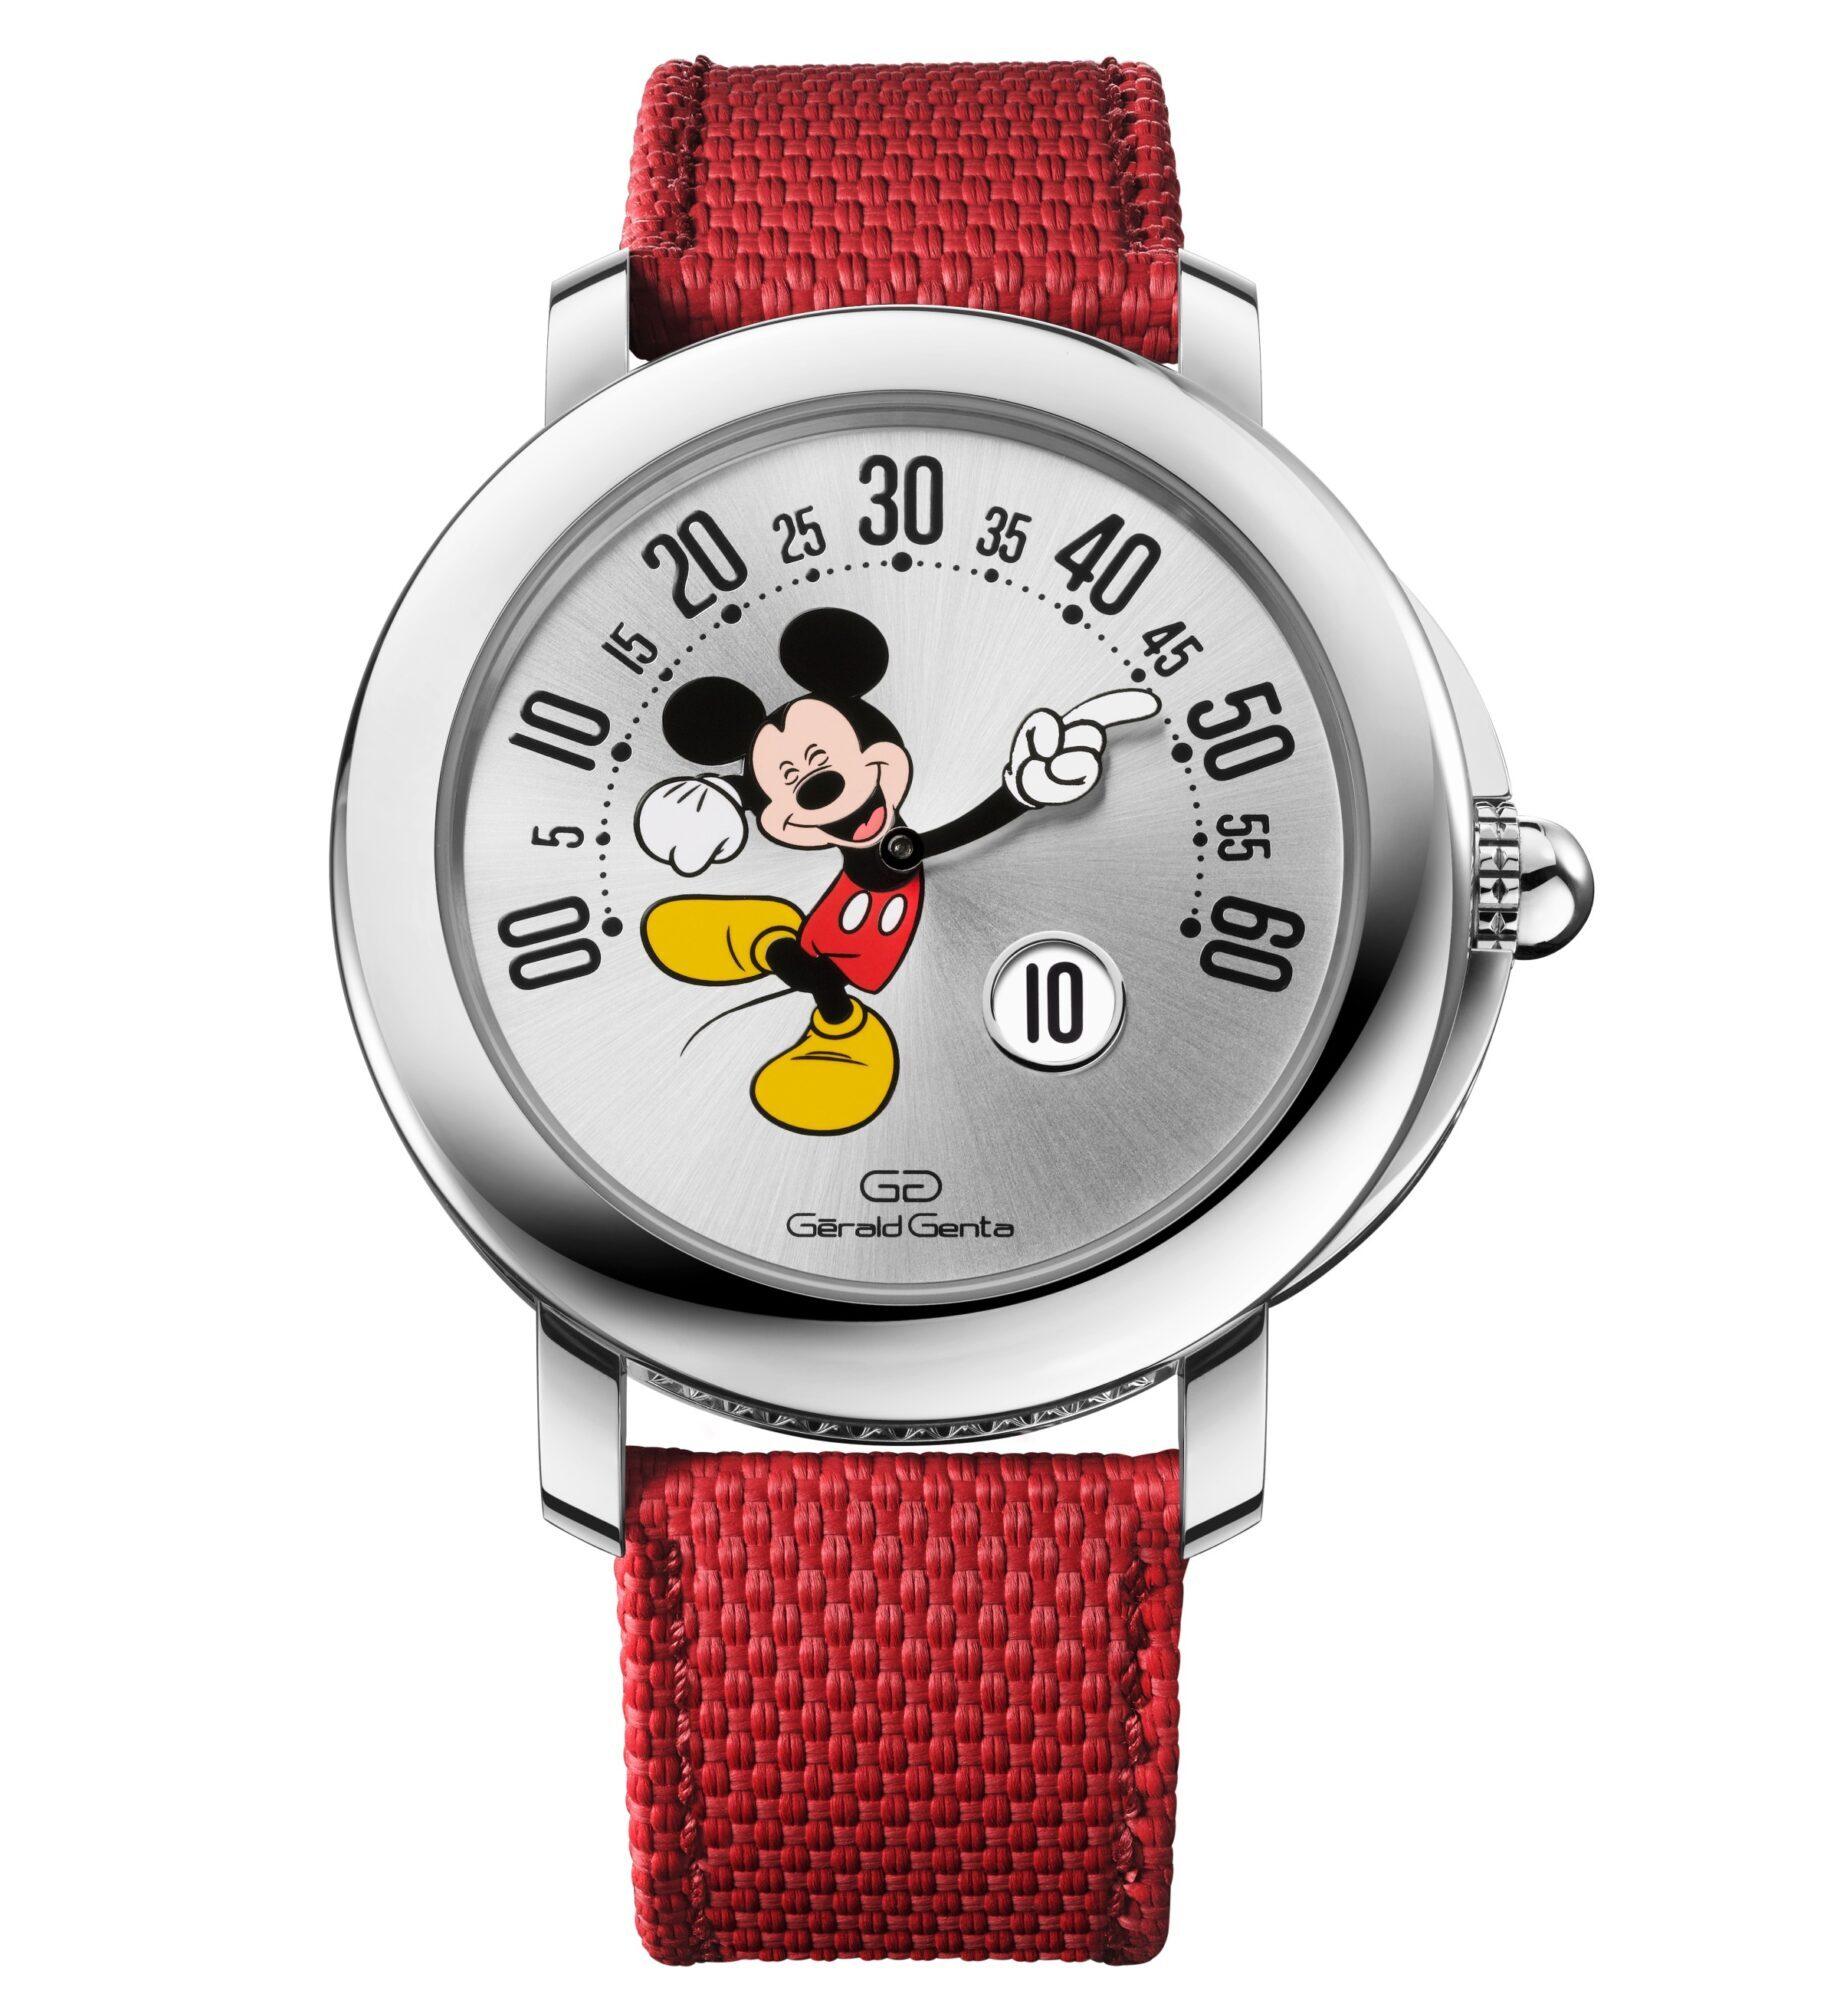 Gerald Genta Arena Retrograde with smiling Disney Mickey Mouse.